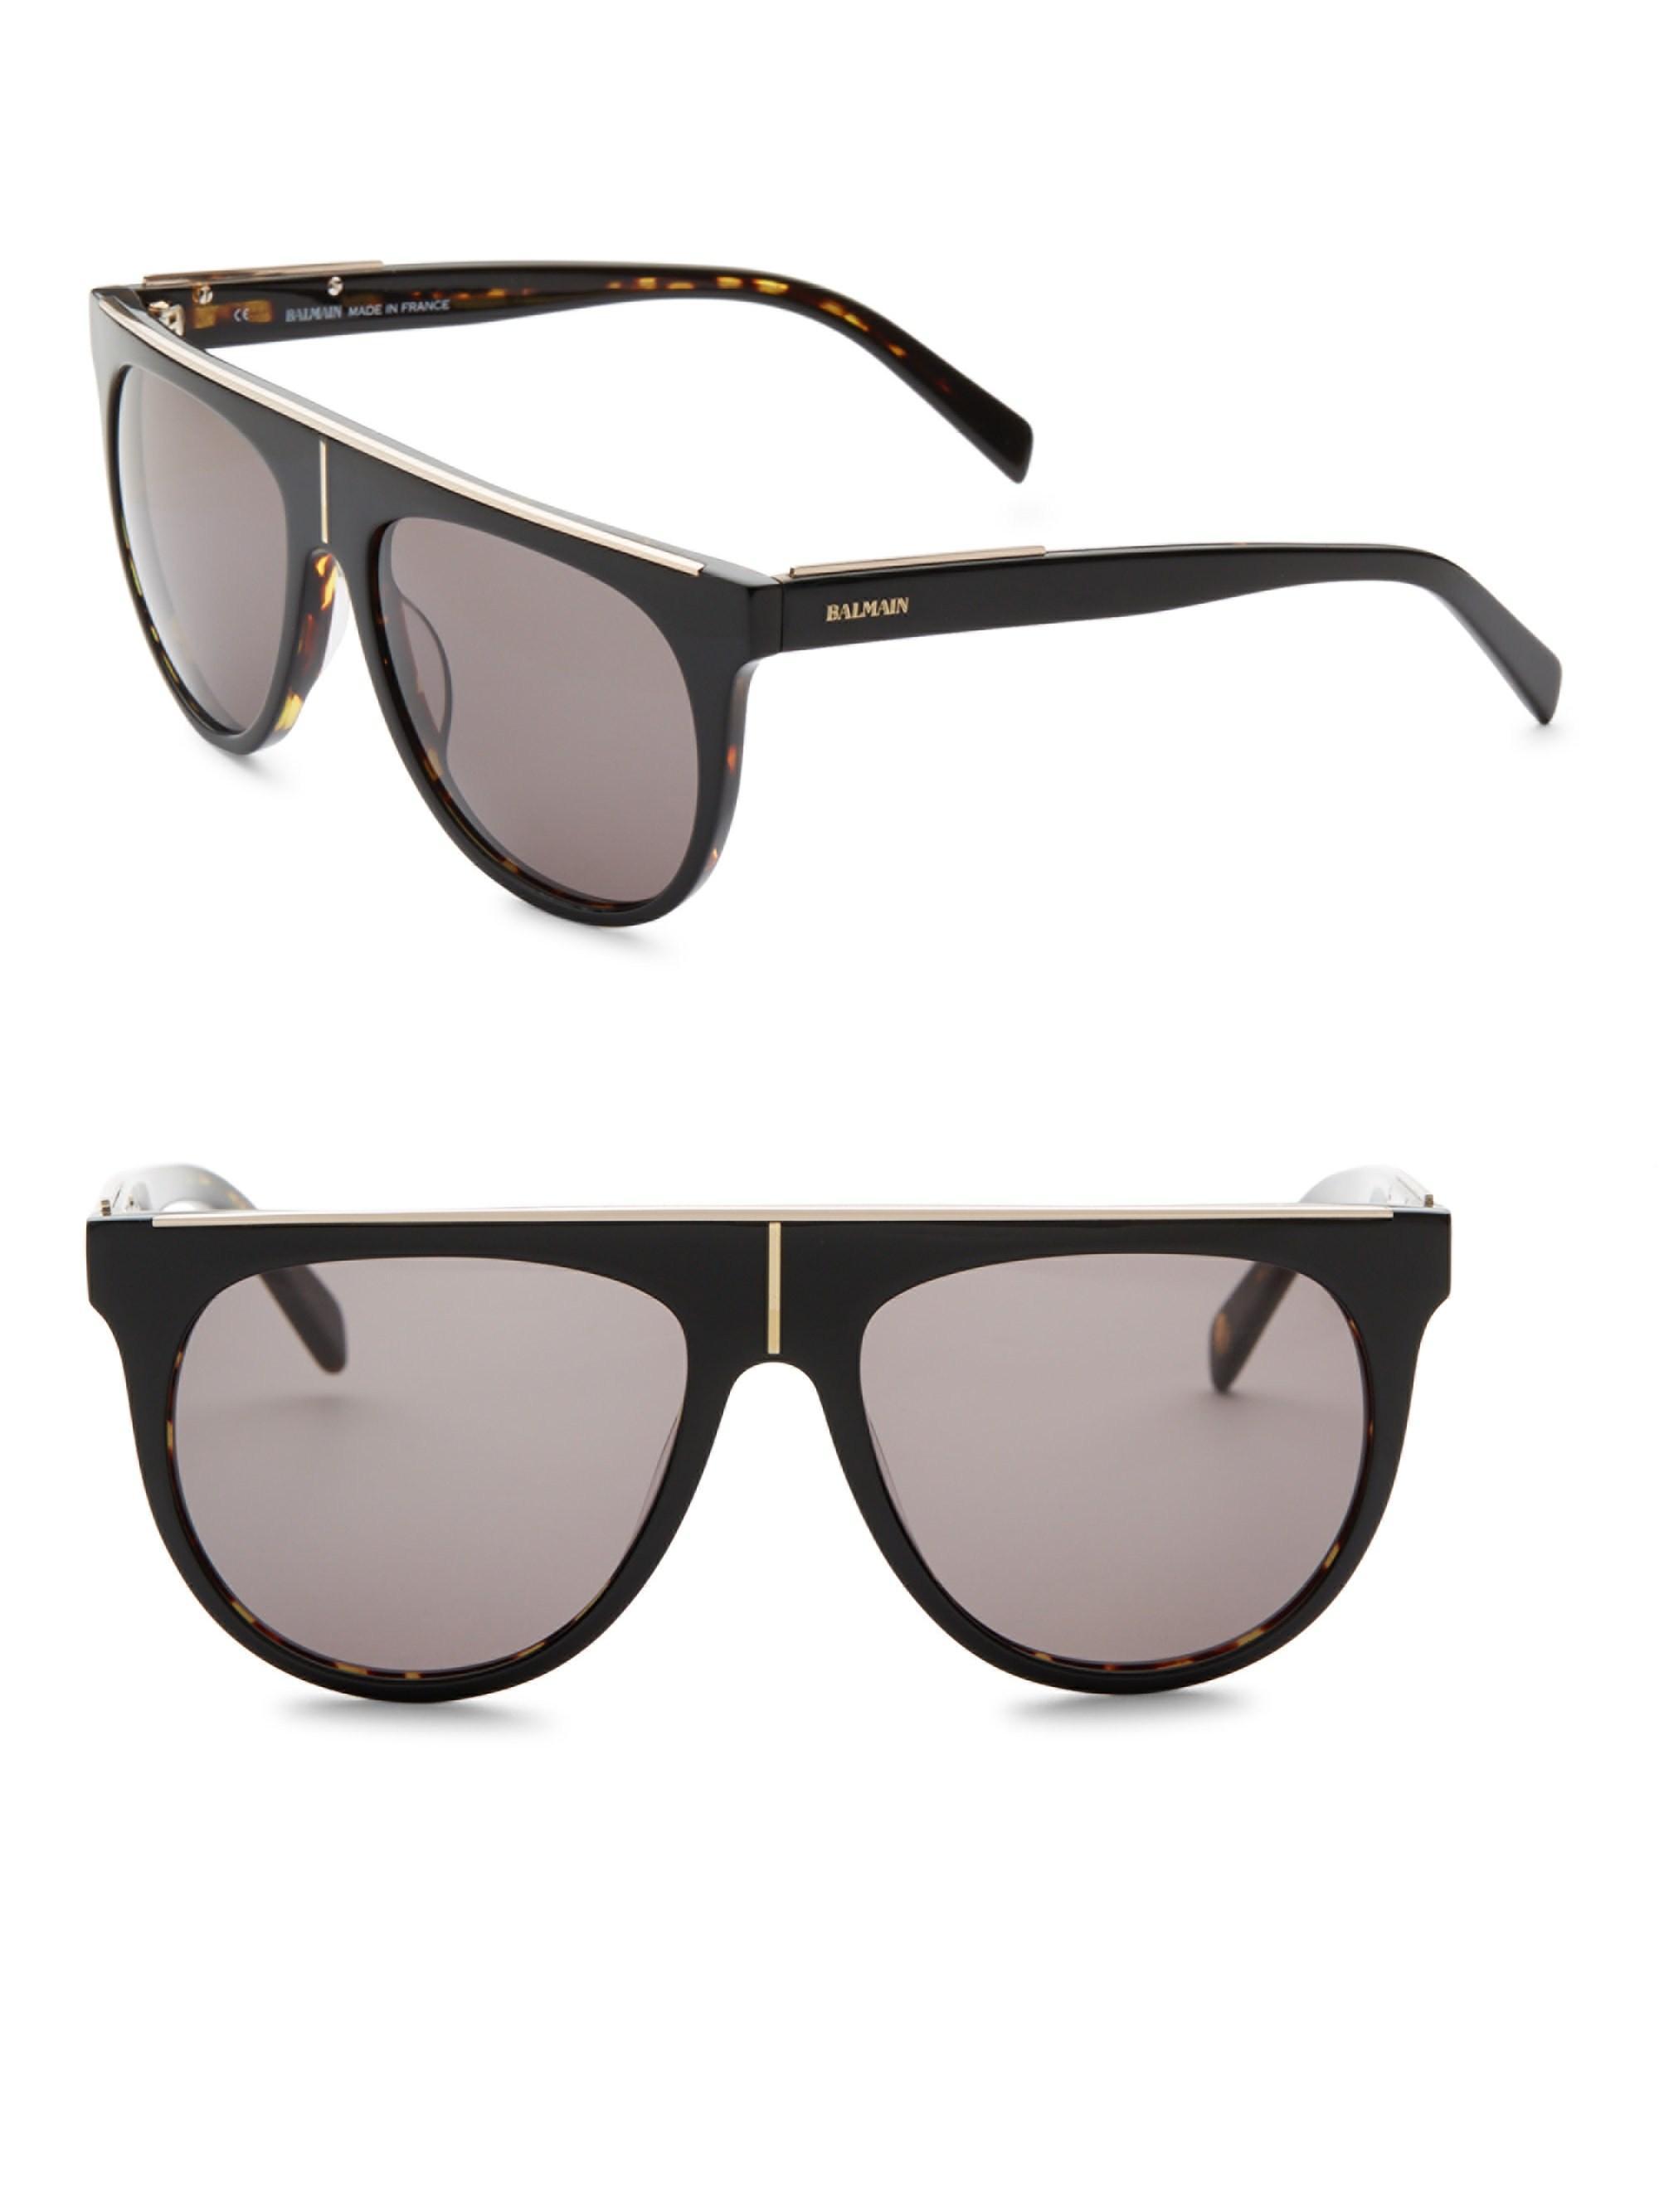 e5d78bd0db5a Balmain Men's Flat Top 55mm Aviator Sunglasses - Black in Black for ...